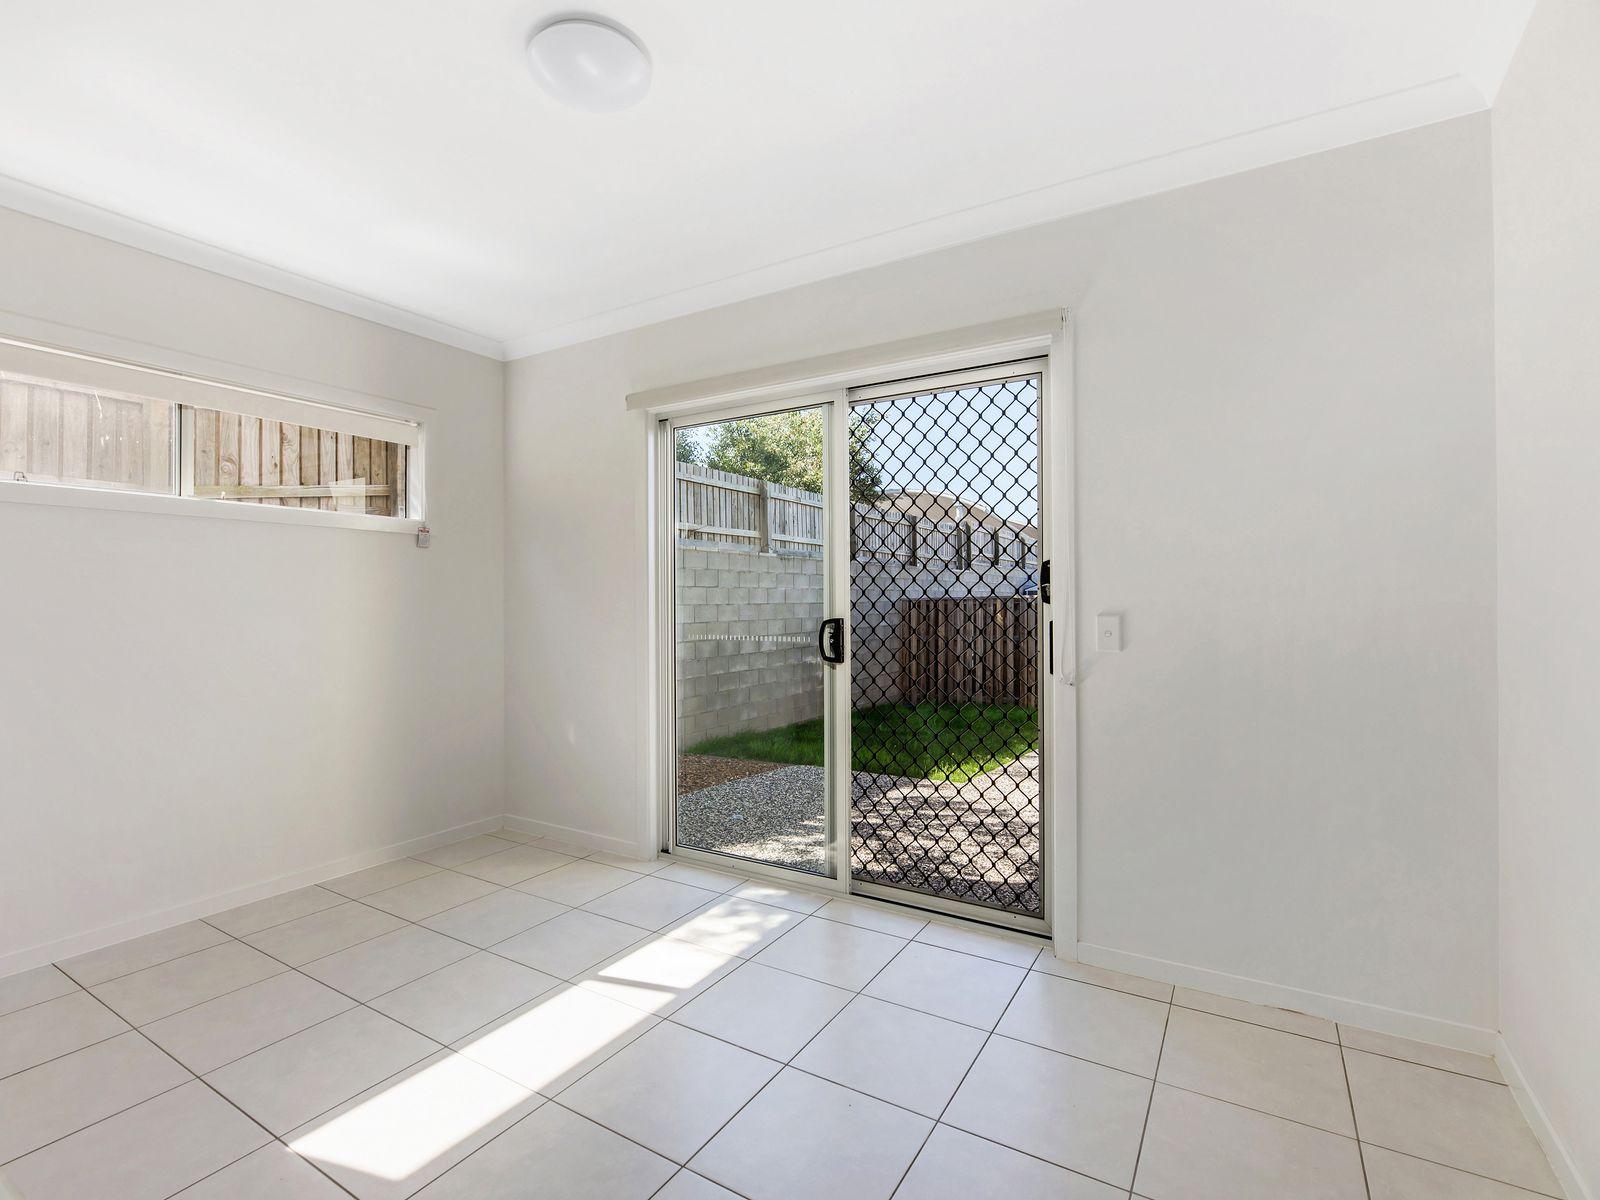 28 Napier Circuit, Silkstone, QLD 4304